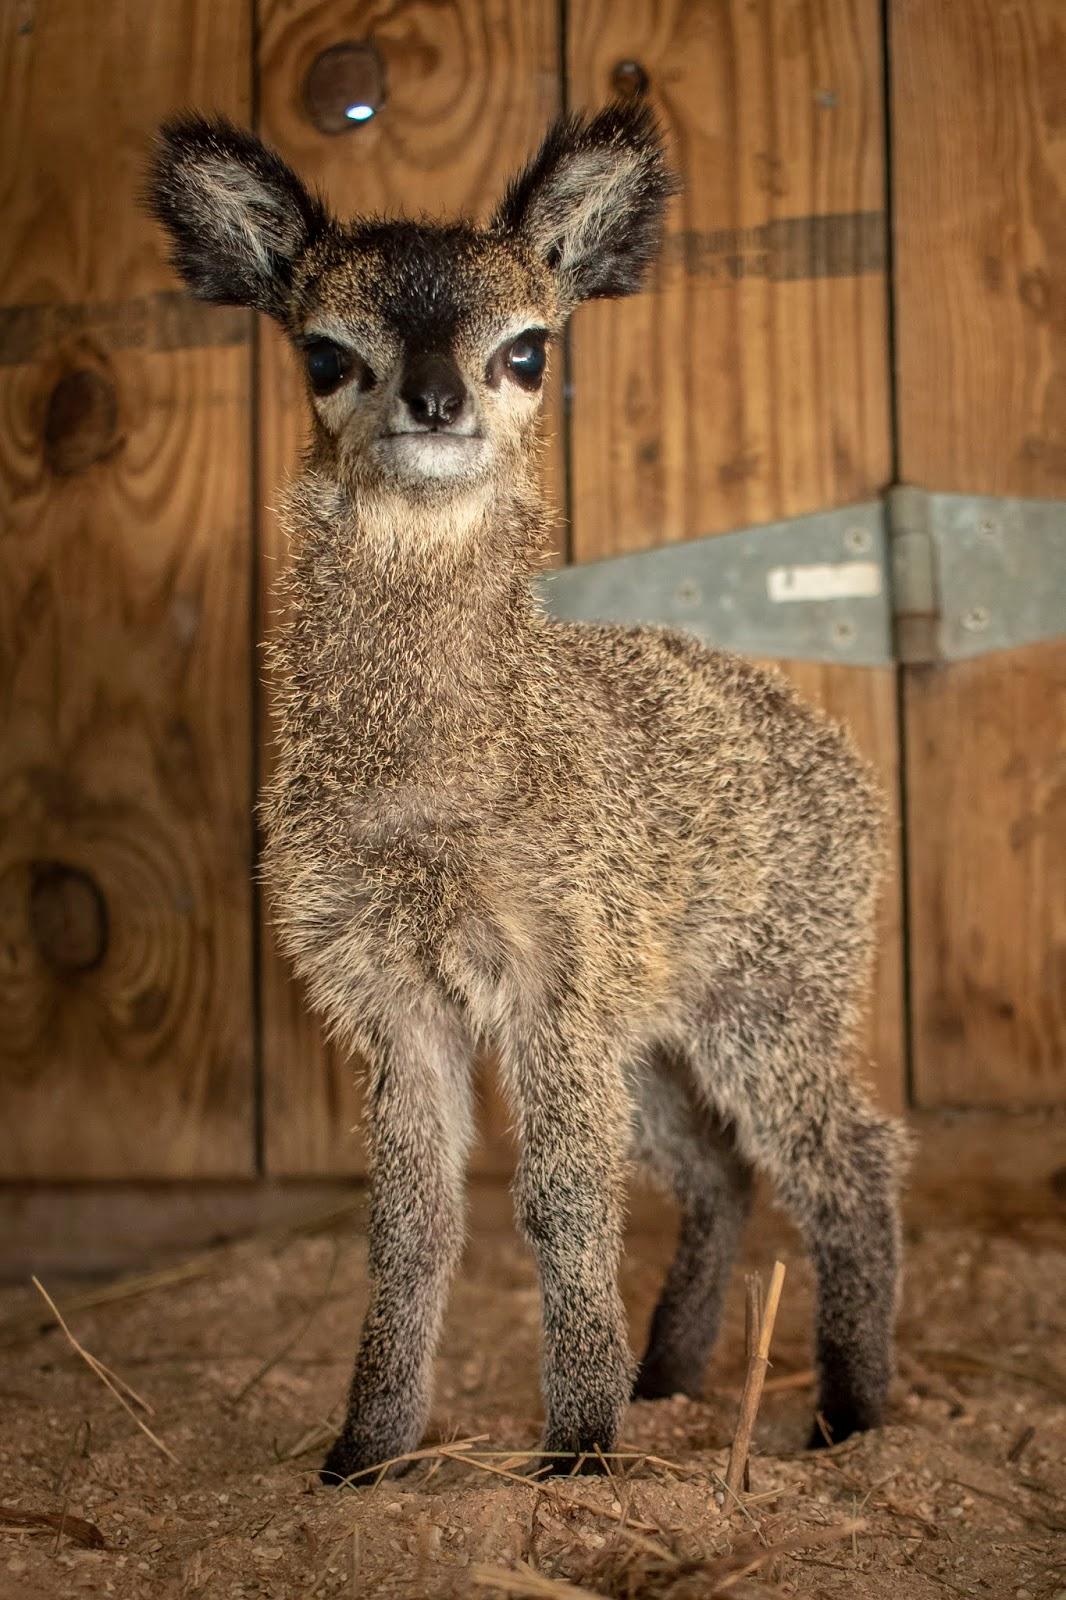 Tiny Rock Star Antelope Born At Brevard Zoo